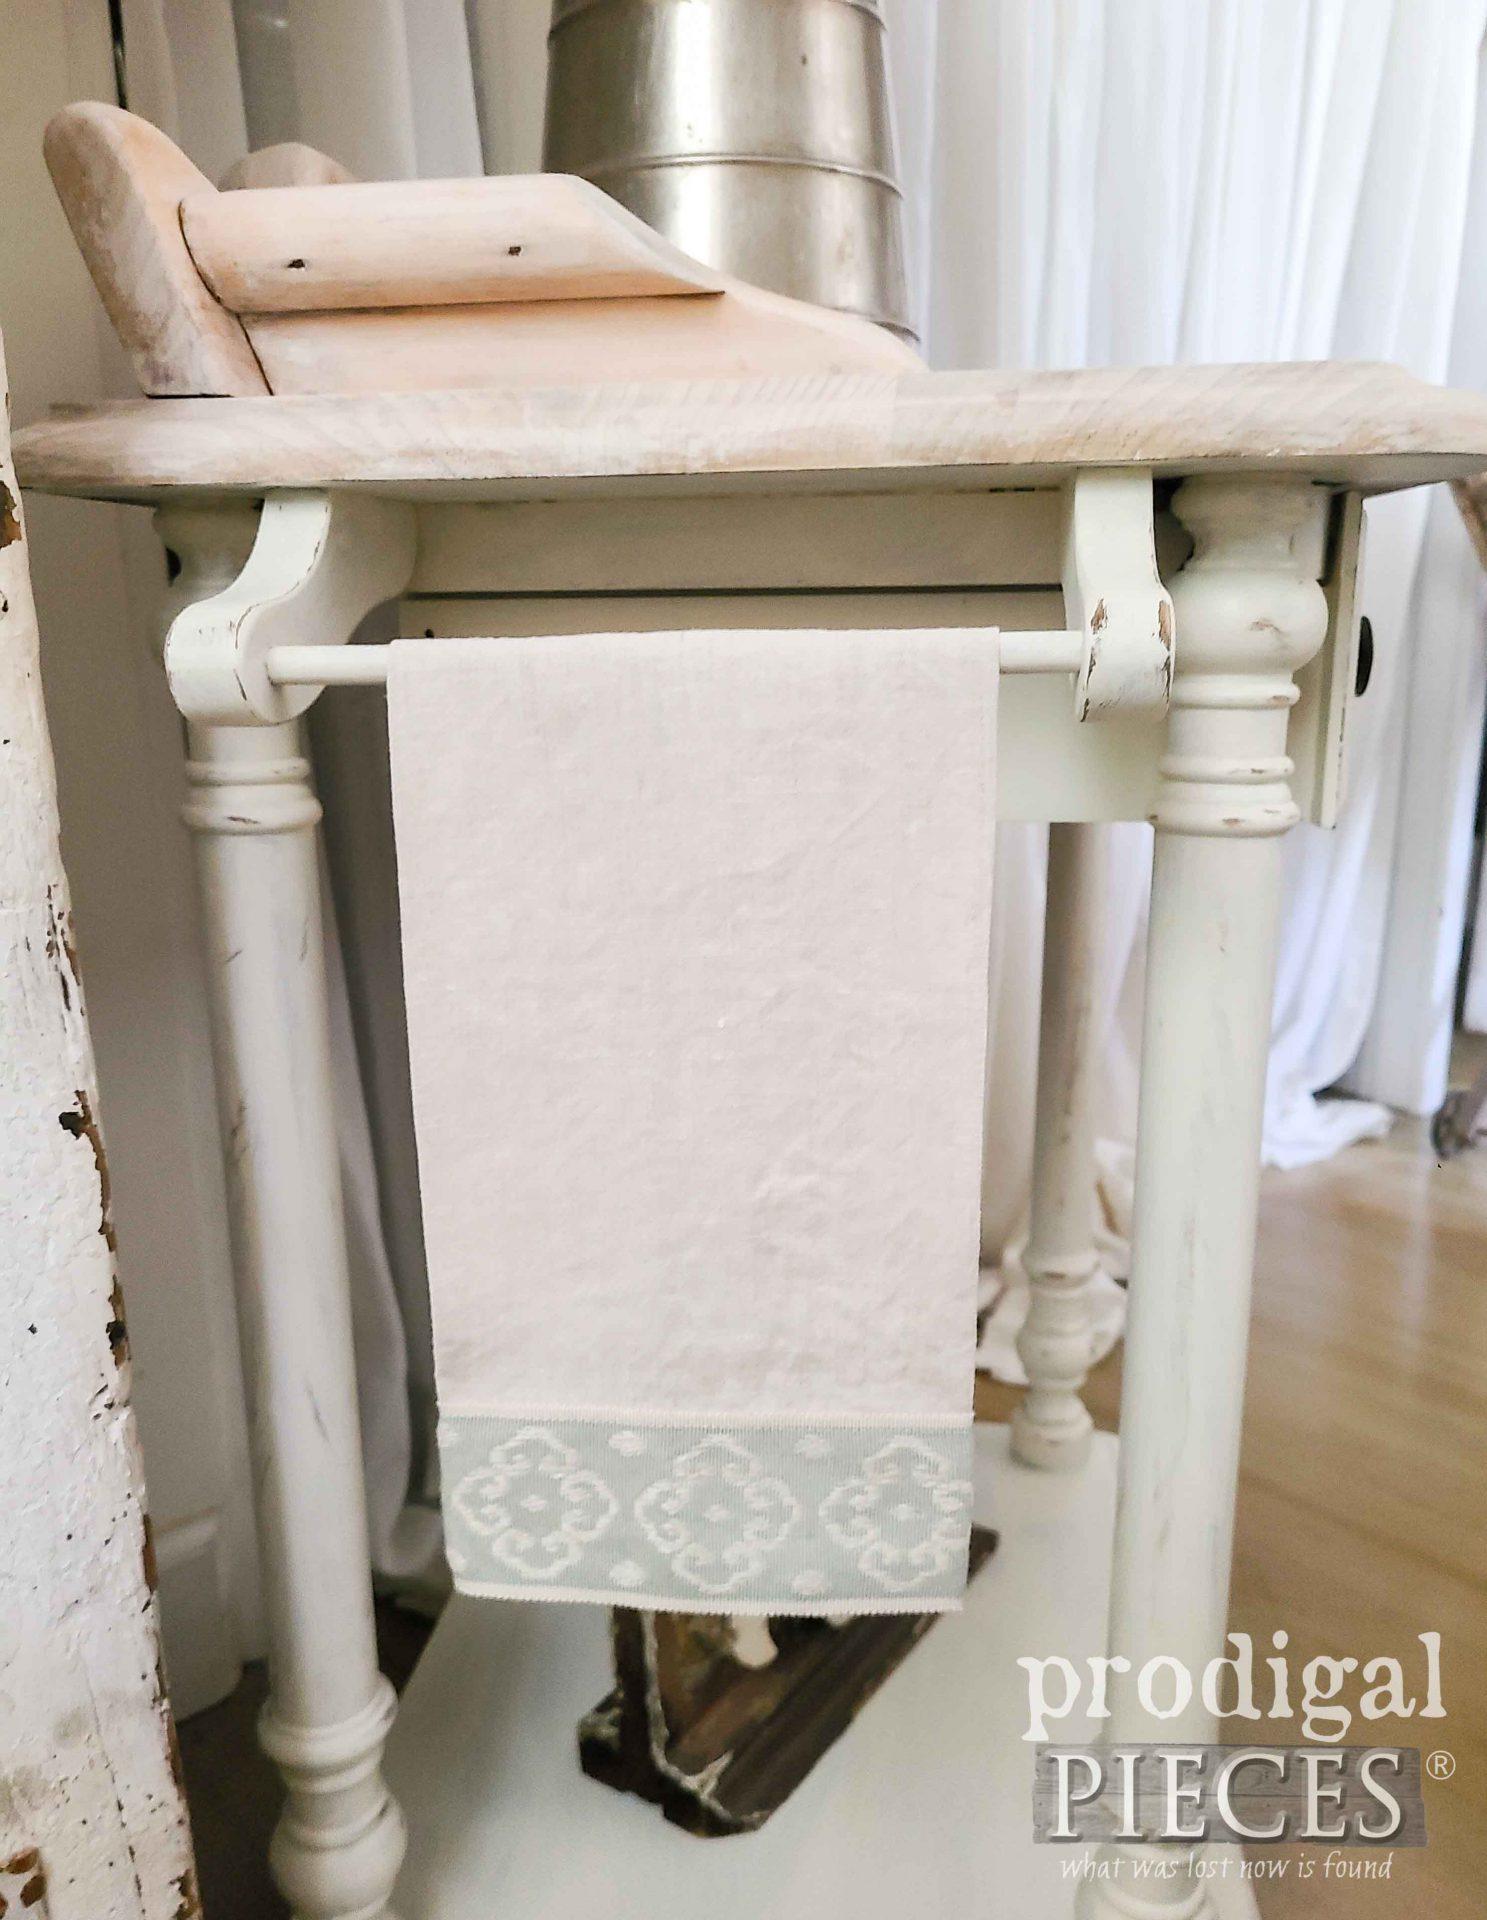 Handmade Linen Towel by Larissa of Prodigal Pieces | prodigalpieces.com #prodigalpieces #handmade #linen #farmhouse #home